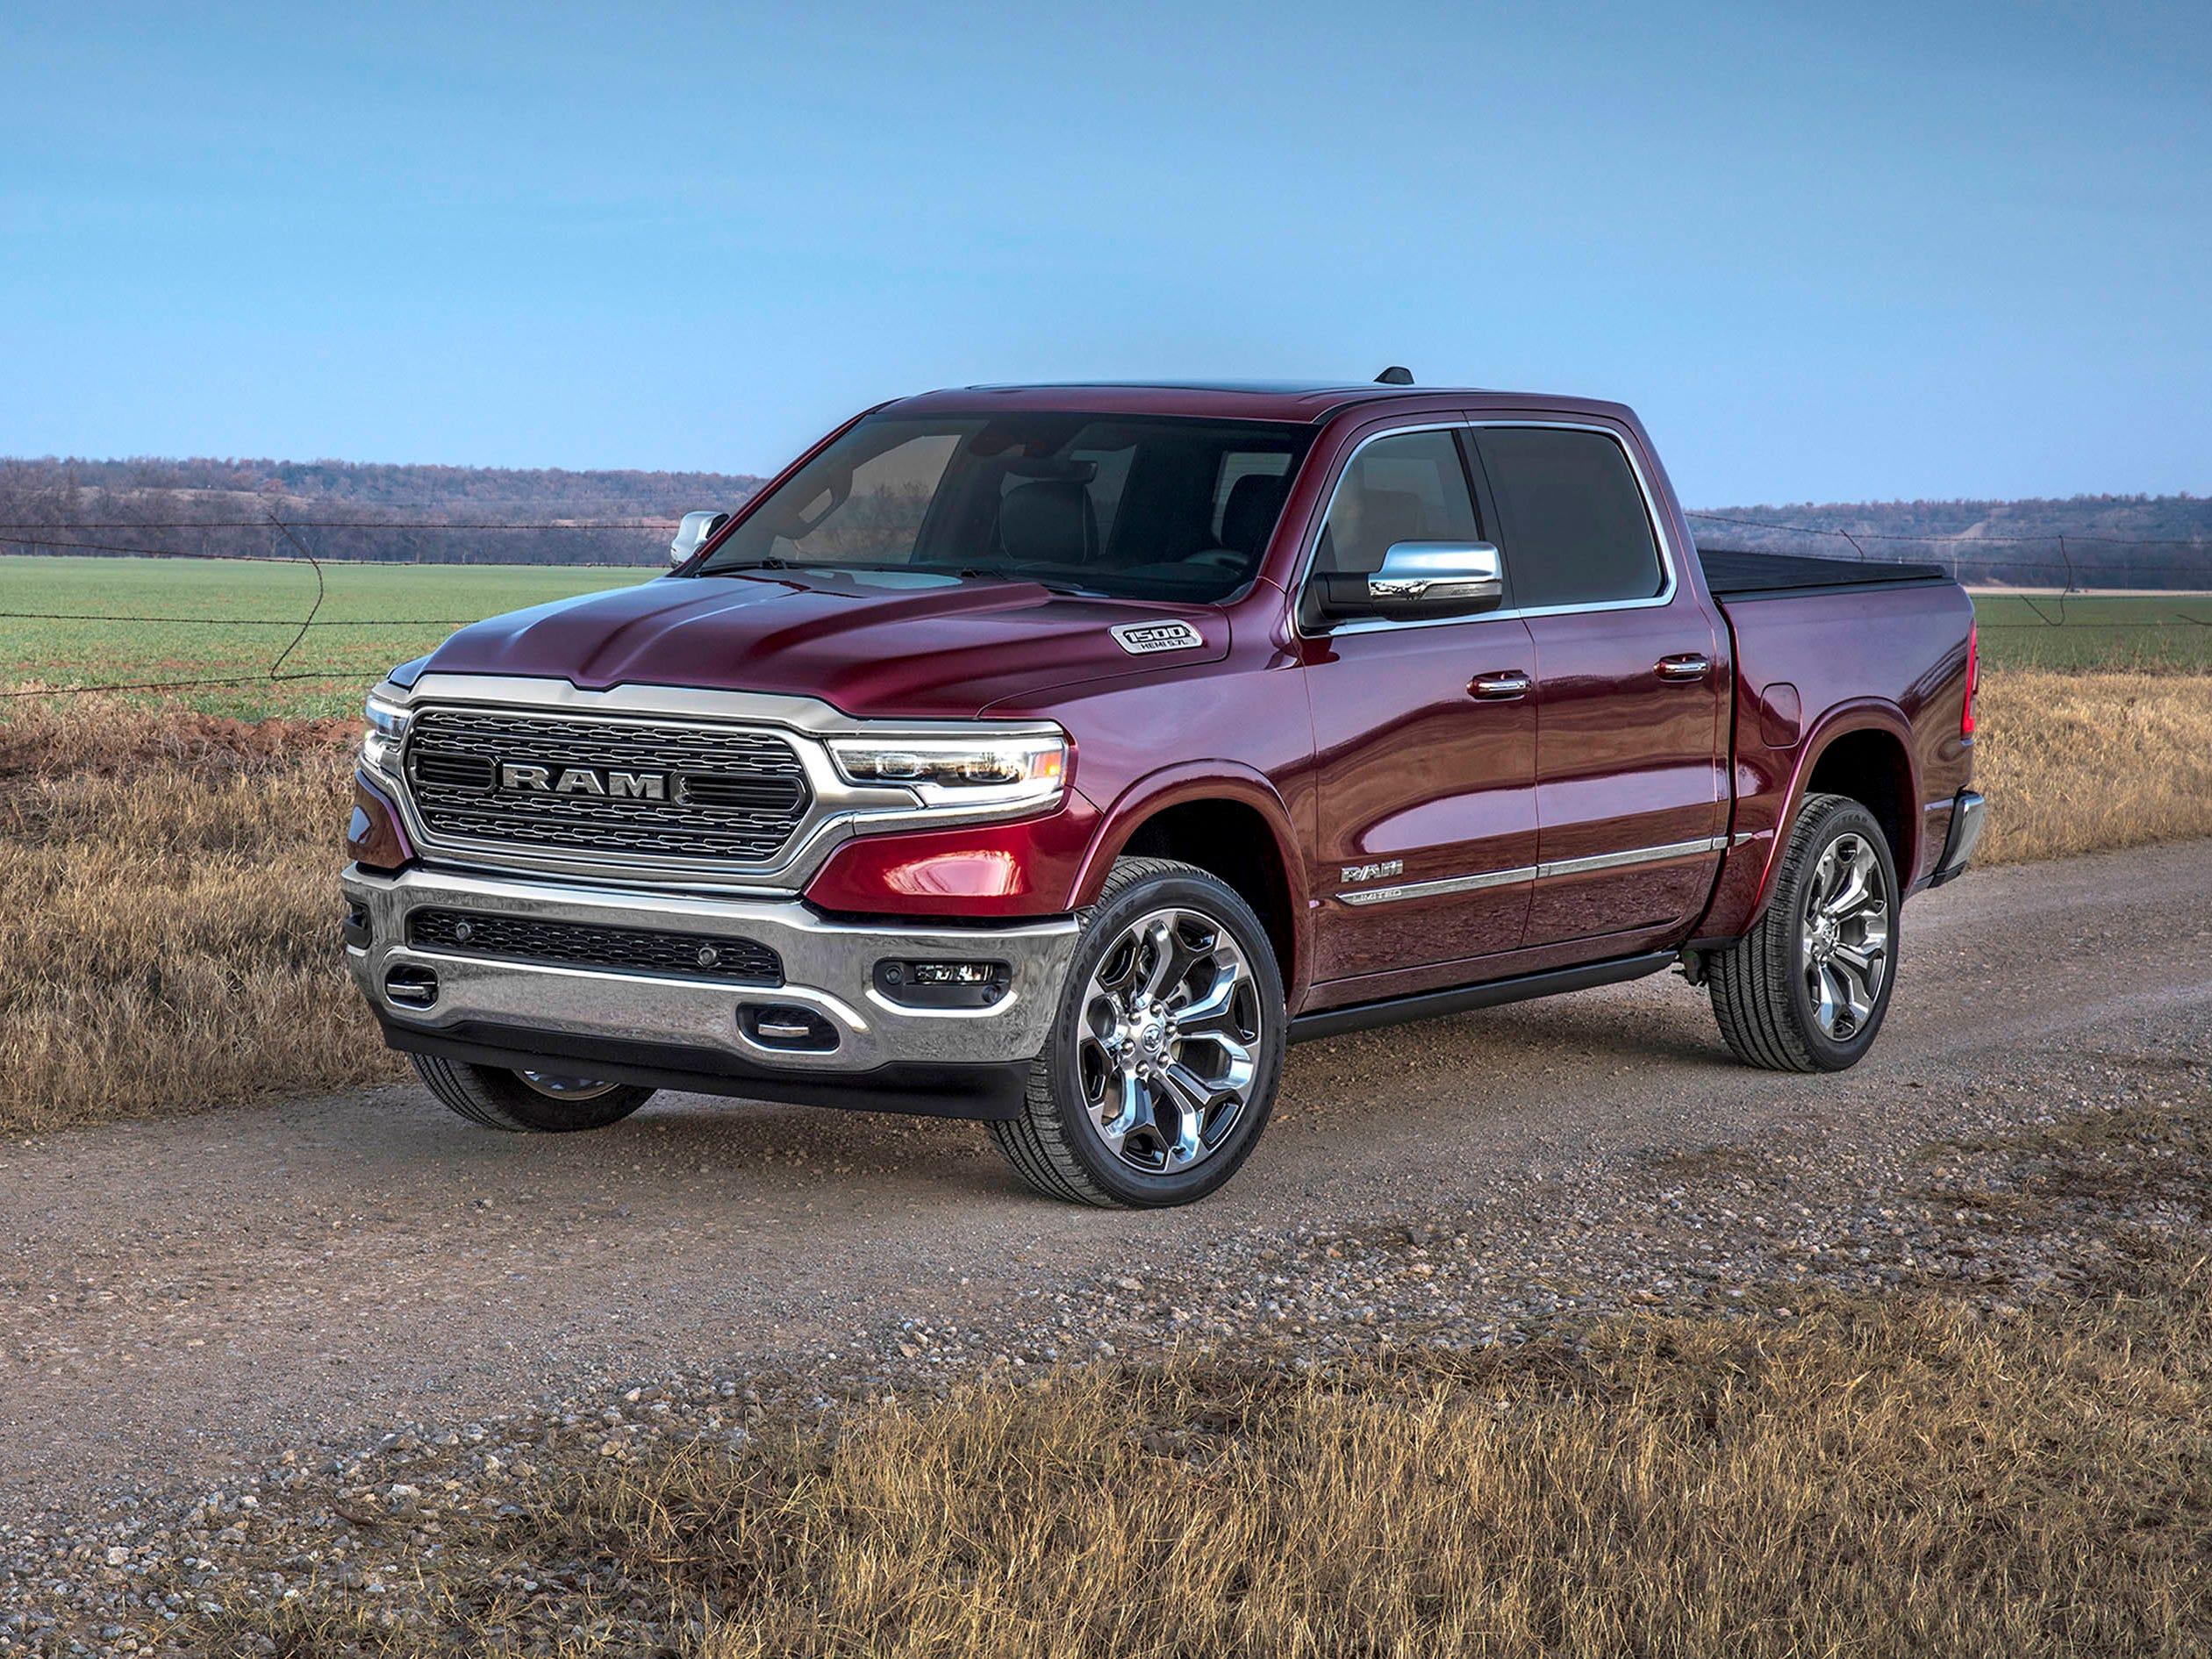 Fiat Chrysler rides Ram trucks, Jeep SUVs to solid November